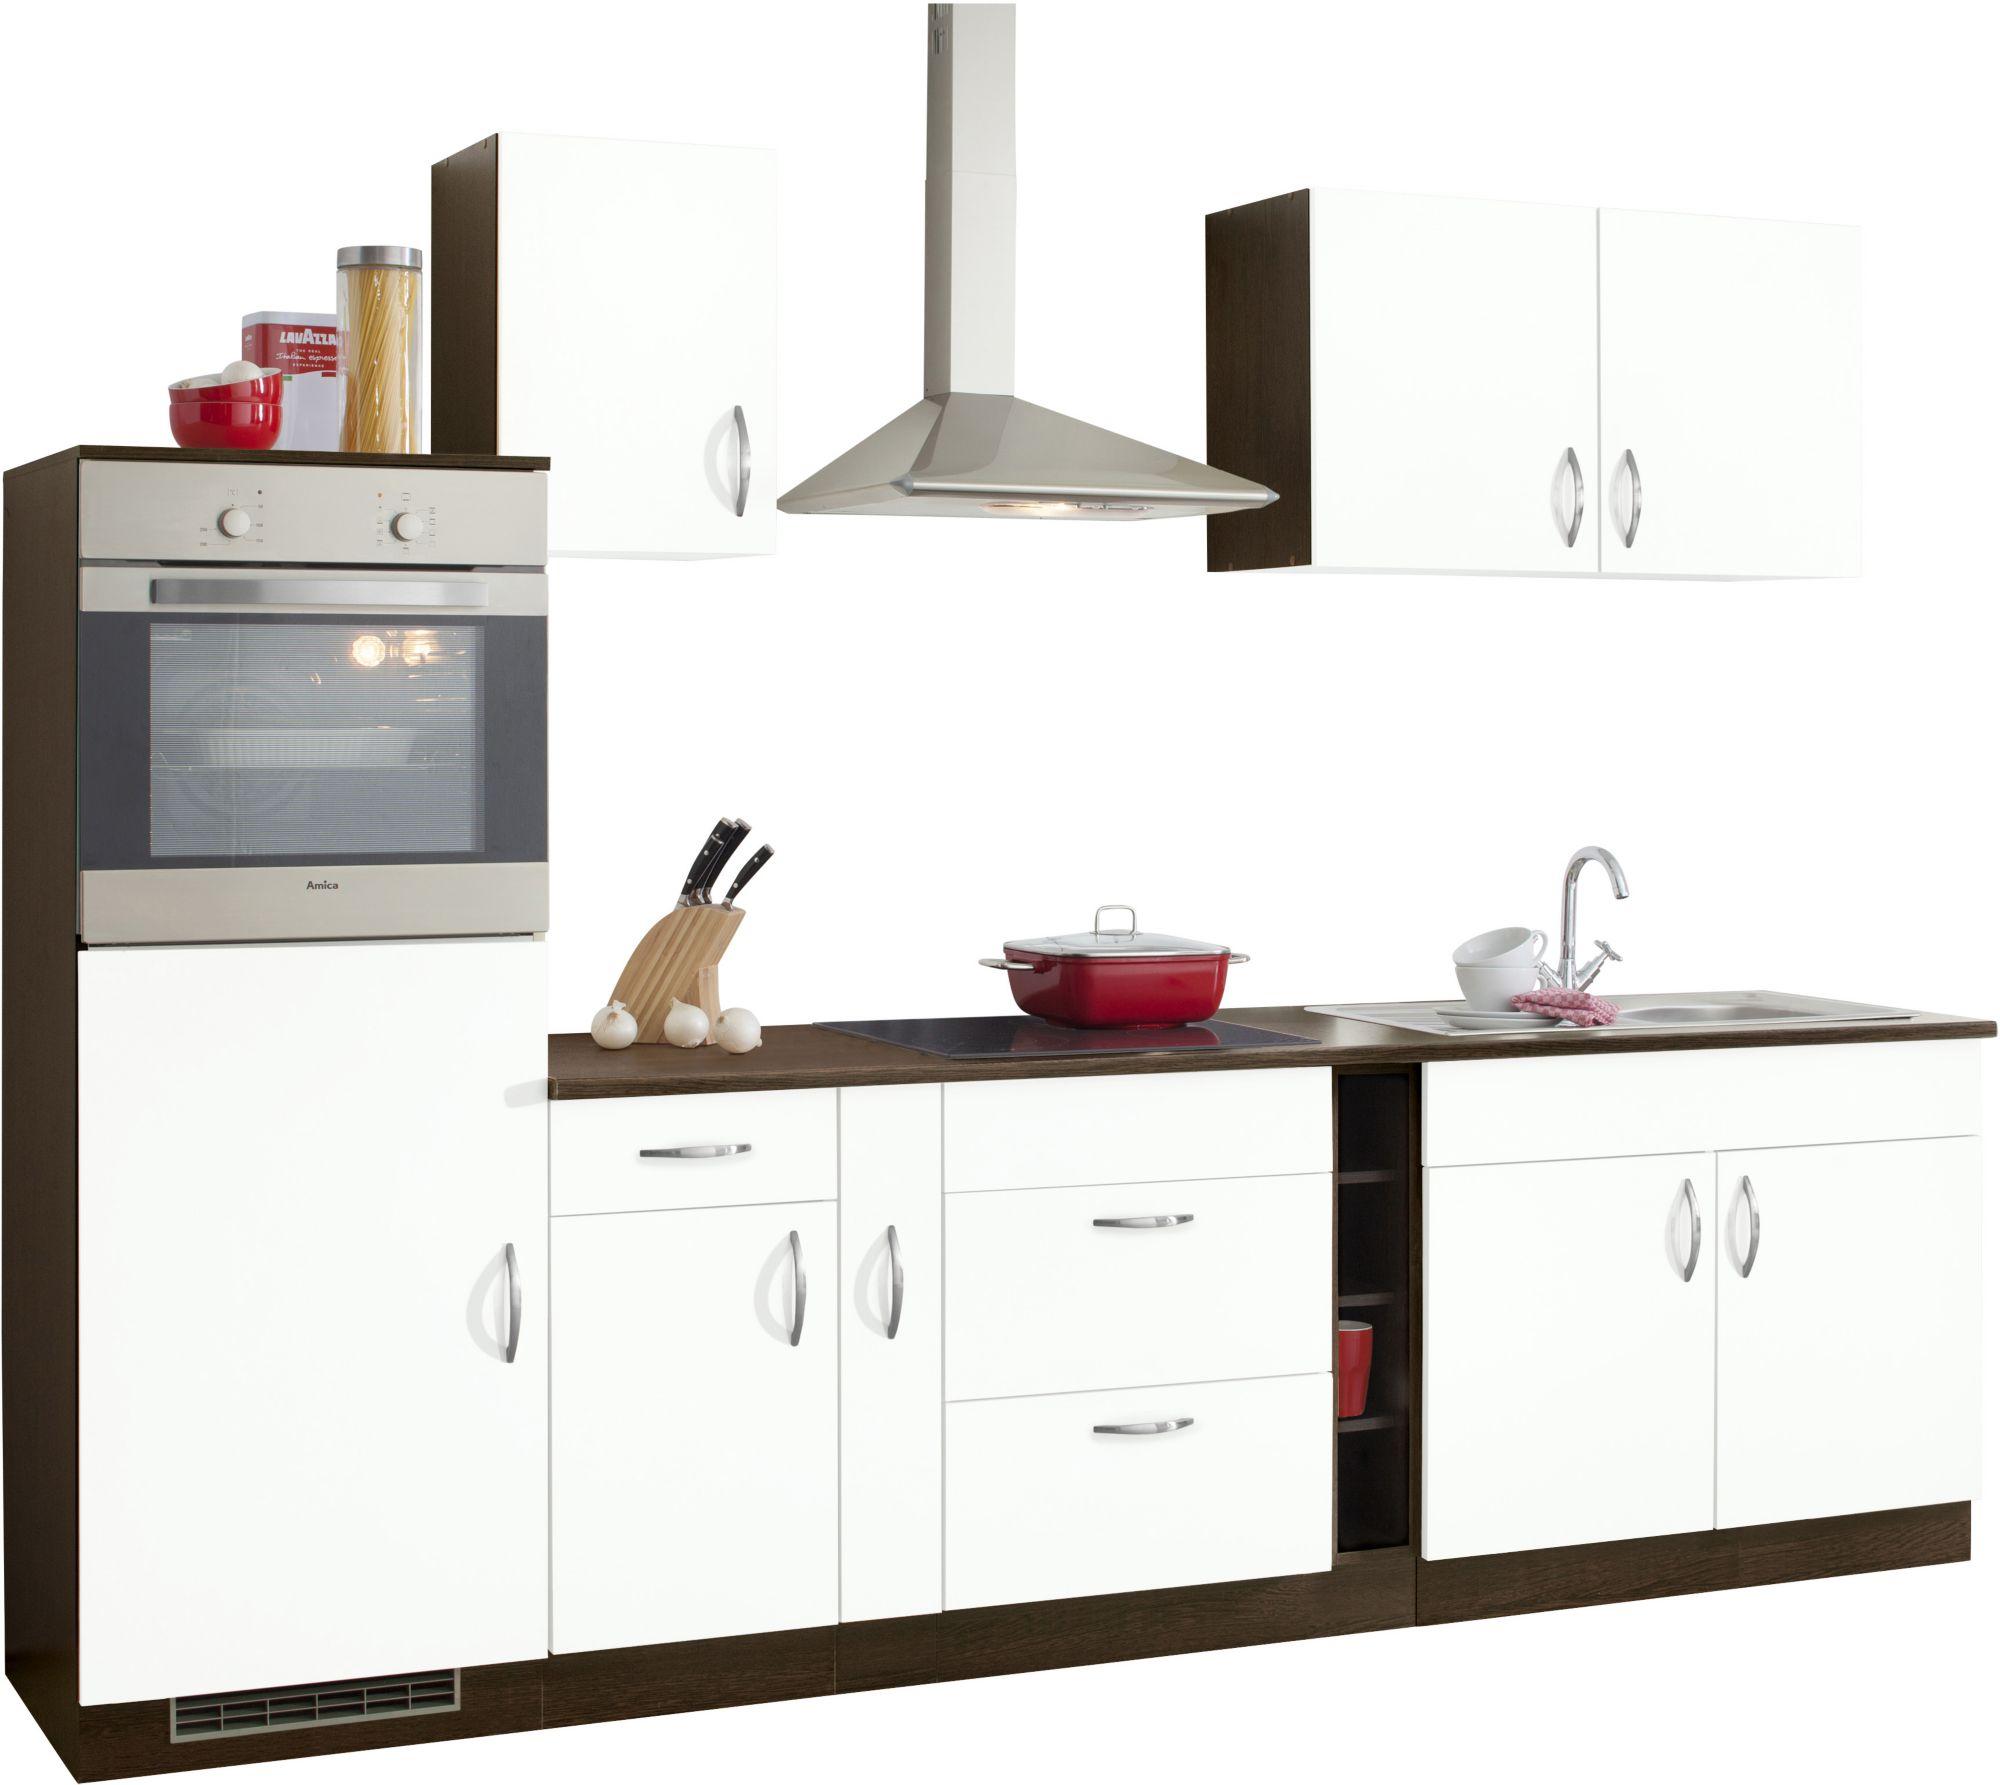 pin k che trend 290cm k chenzeile k chenblock variabel. Black Bedroom Furniture Sets. Home Design Ideas